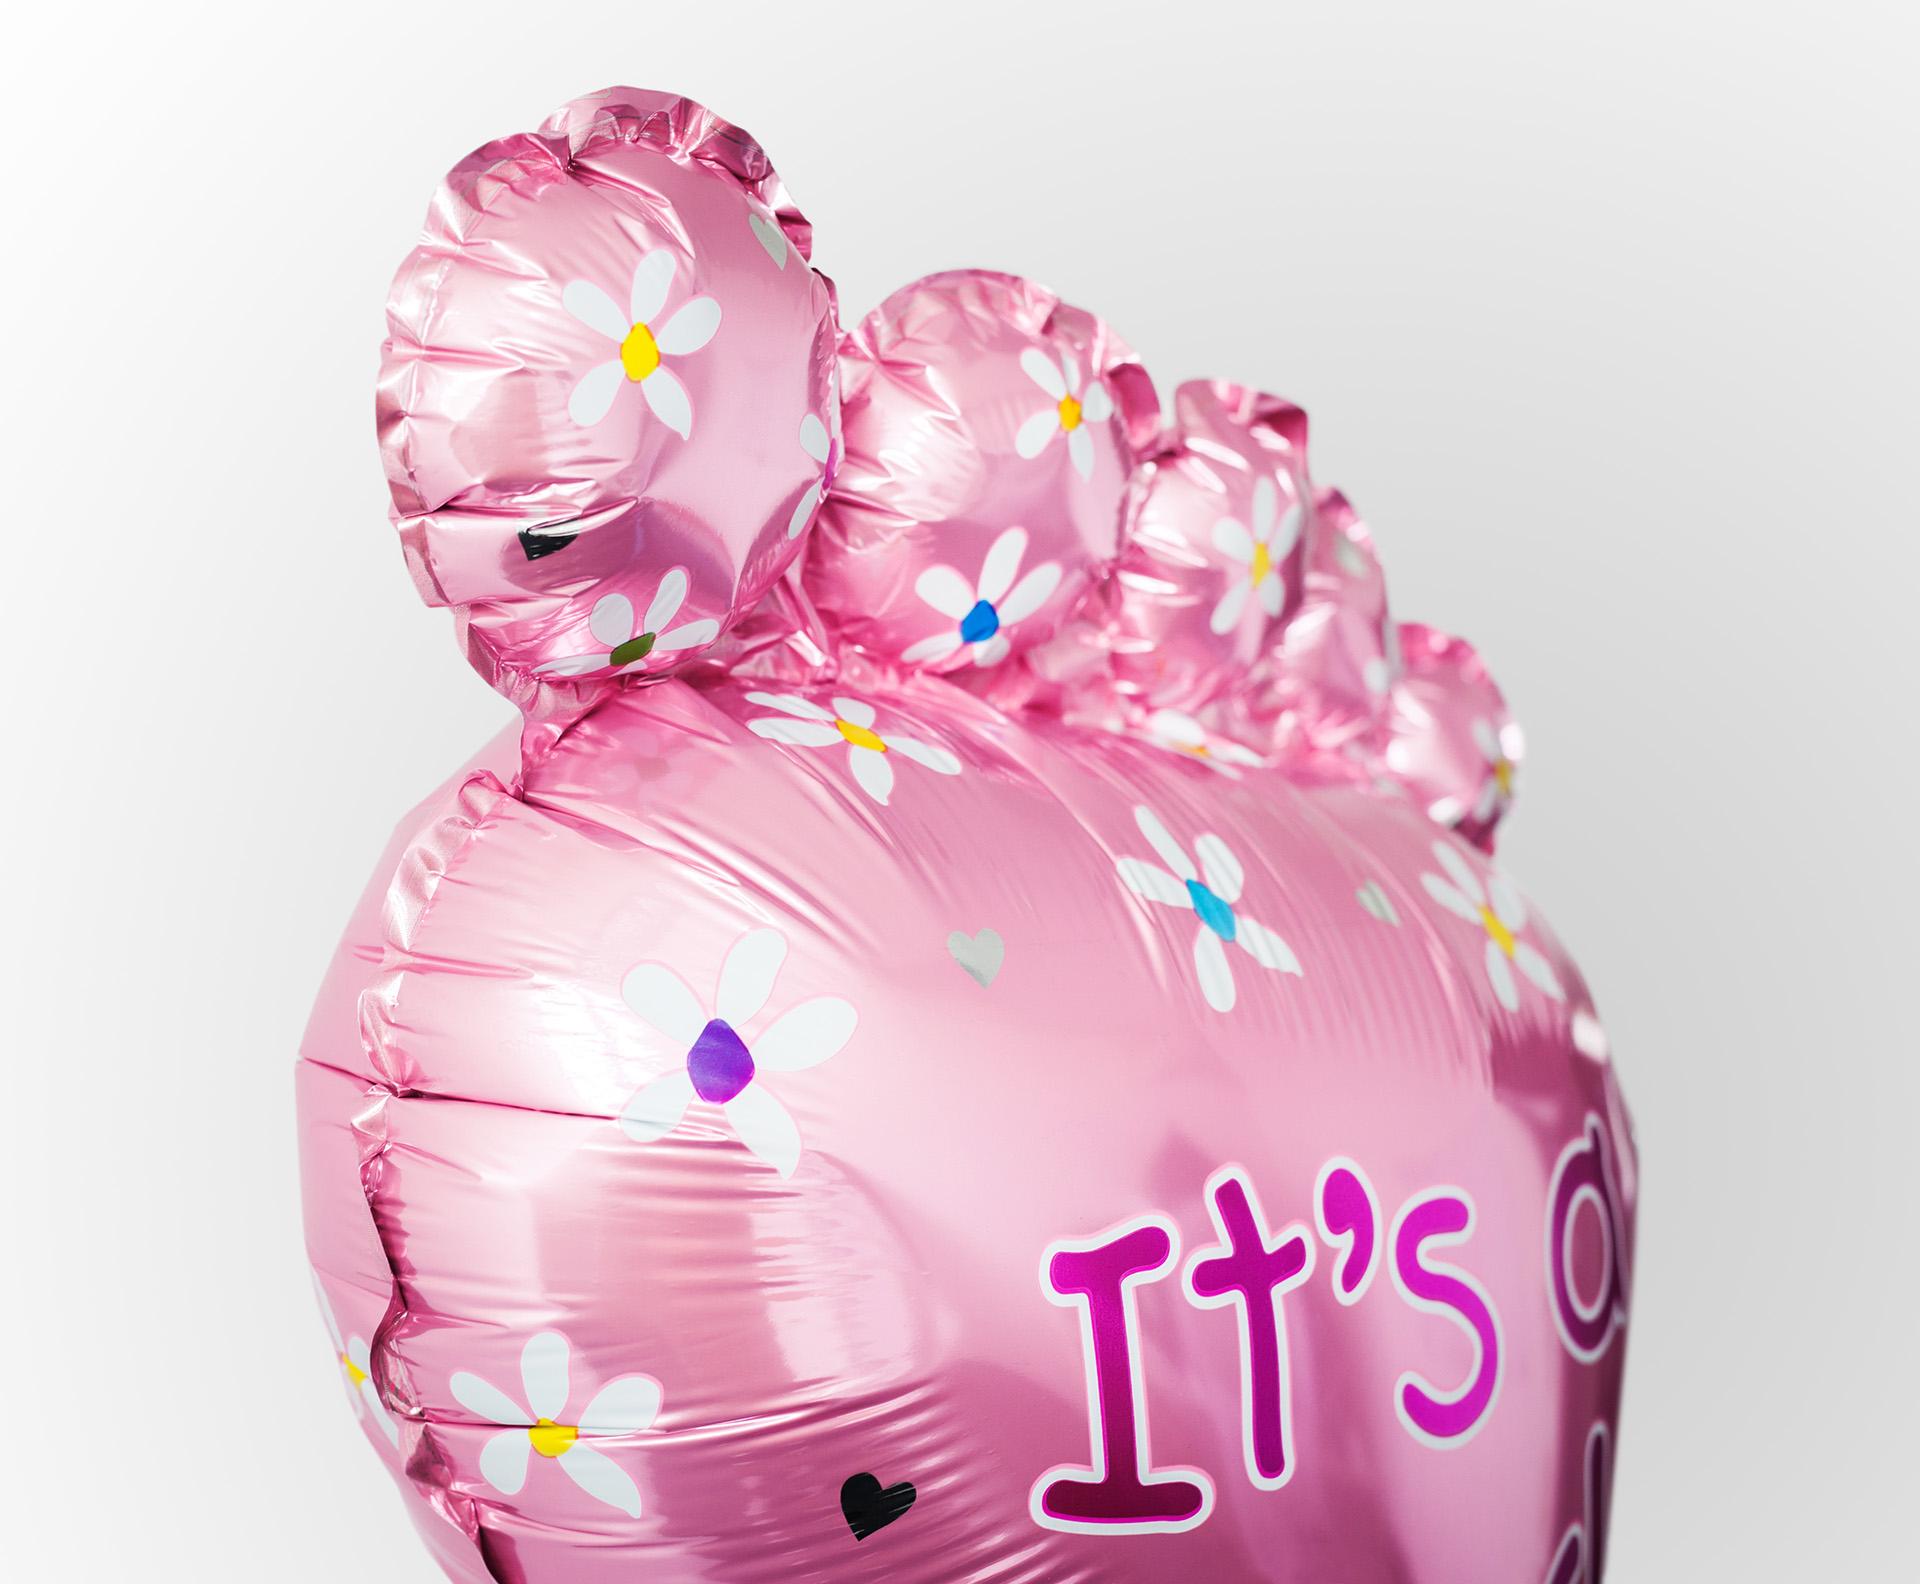 mybeautyworld24 runder geburtstag dekozubeh r tischdeko ballongas geschenk neugeborenes. Black Bedroom Furniture Sets. Home Design Ideas